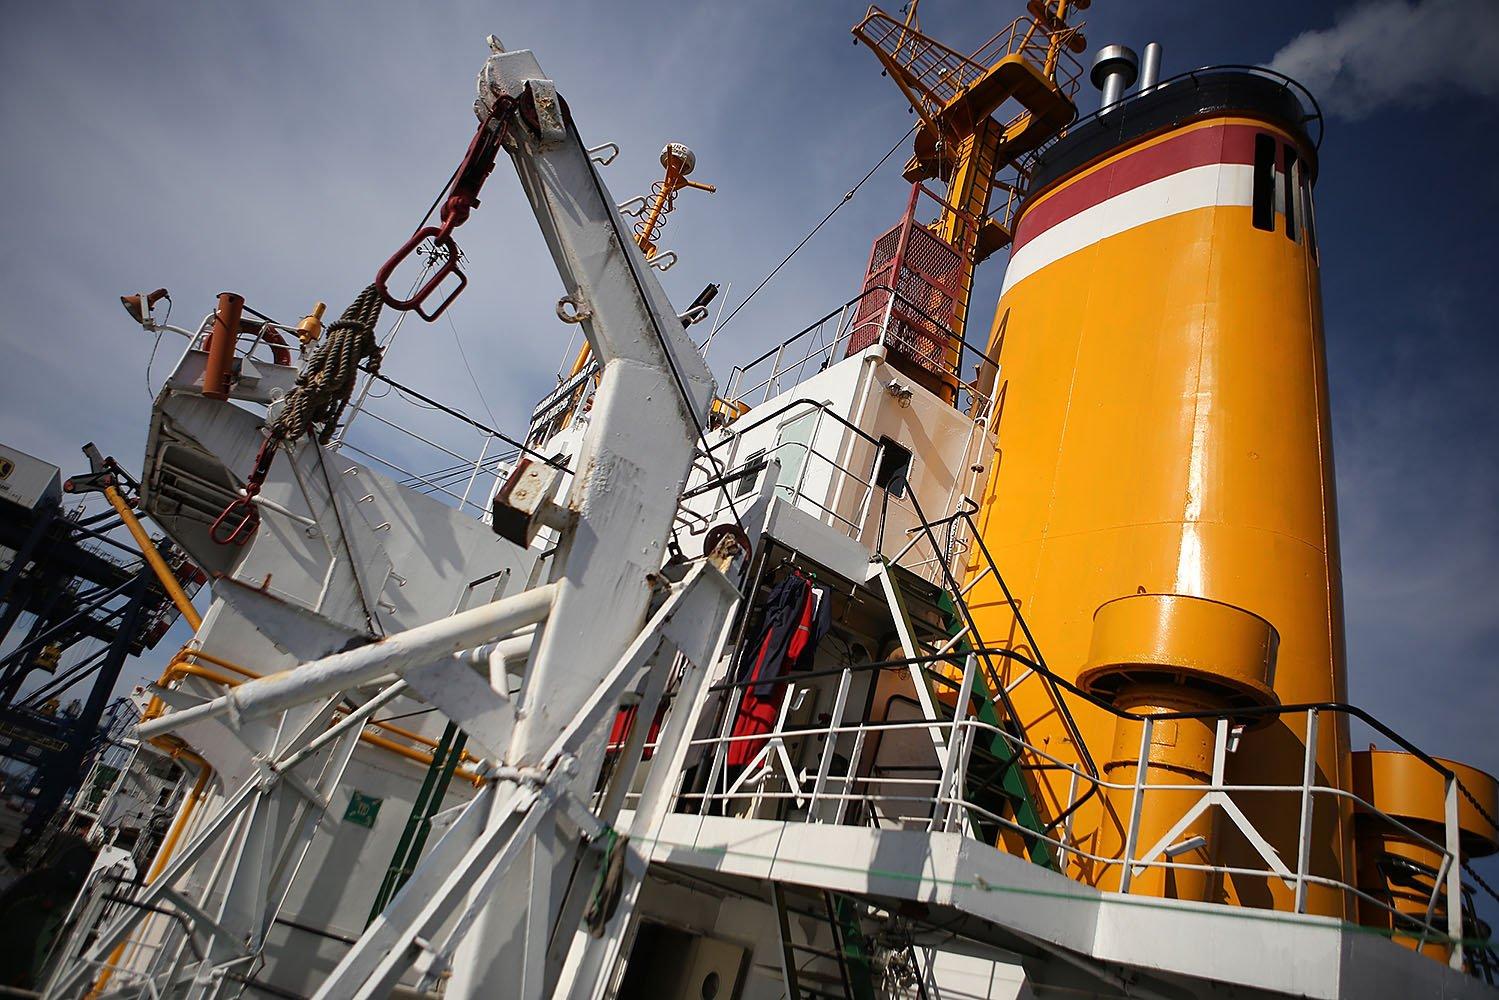 Kapal dengan bobot 3.000 DWT ini dapat mengangkut berbagai bahan kebutuhan pokok dan alat berat untuk bongkar muat barang, forklift serta alat bantu lainnya.